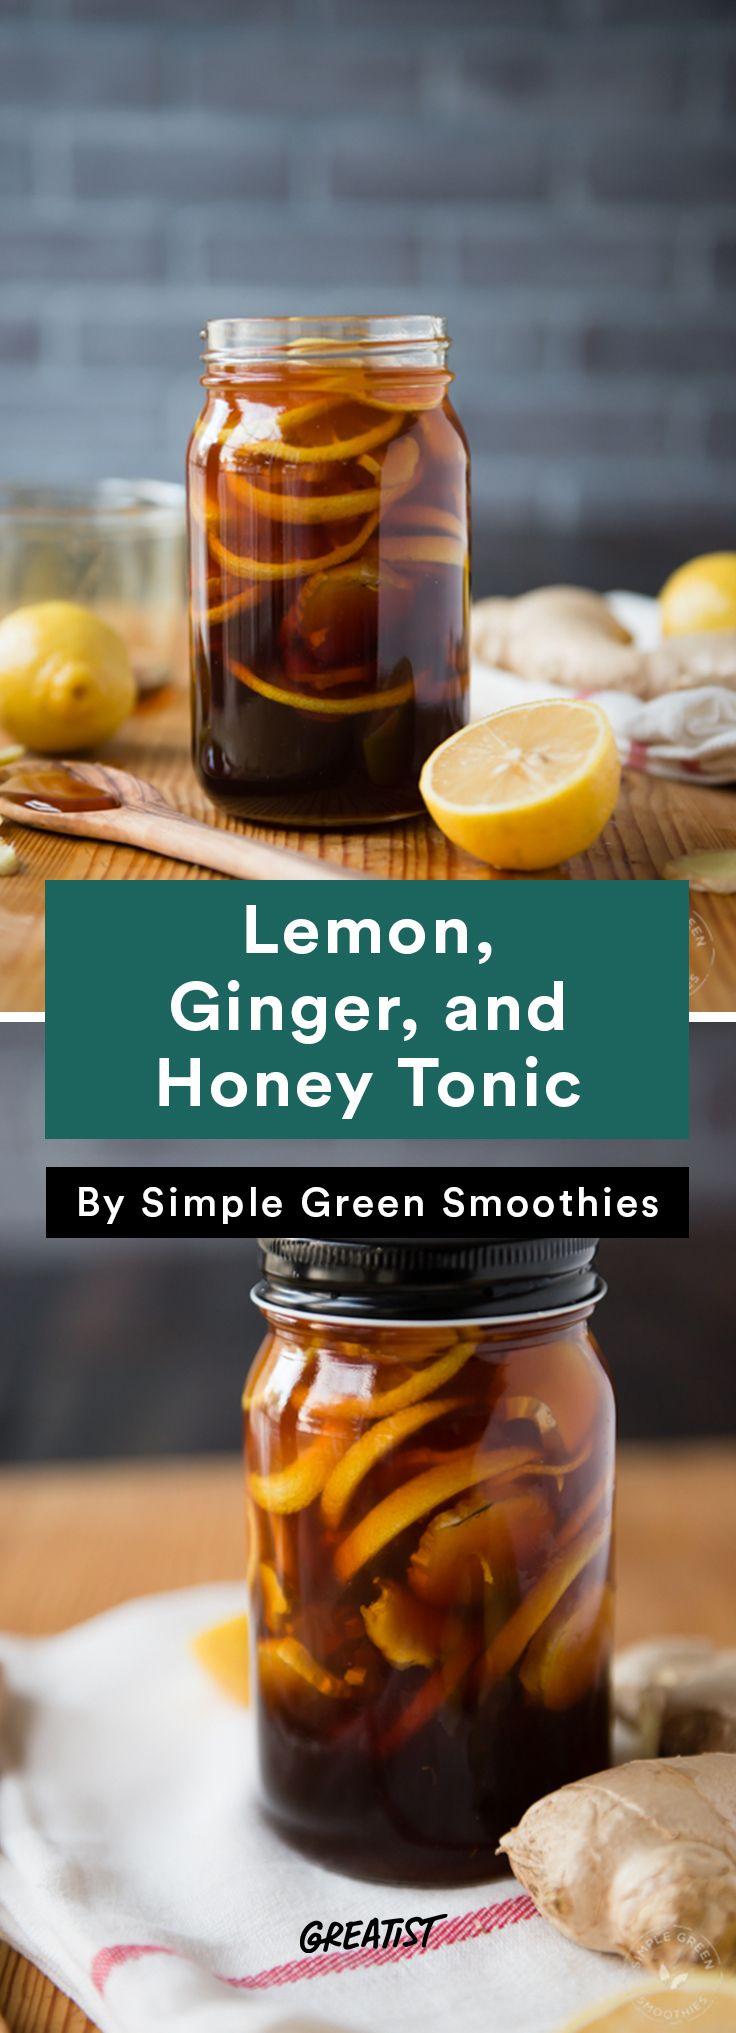 6. Lemon, Ginger, and Honey Tonic #warm #drinks #recipes http://greatist.com/eat/warm-drink-recipes-better-than-a-pumpkin-spice-latte